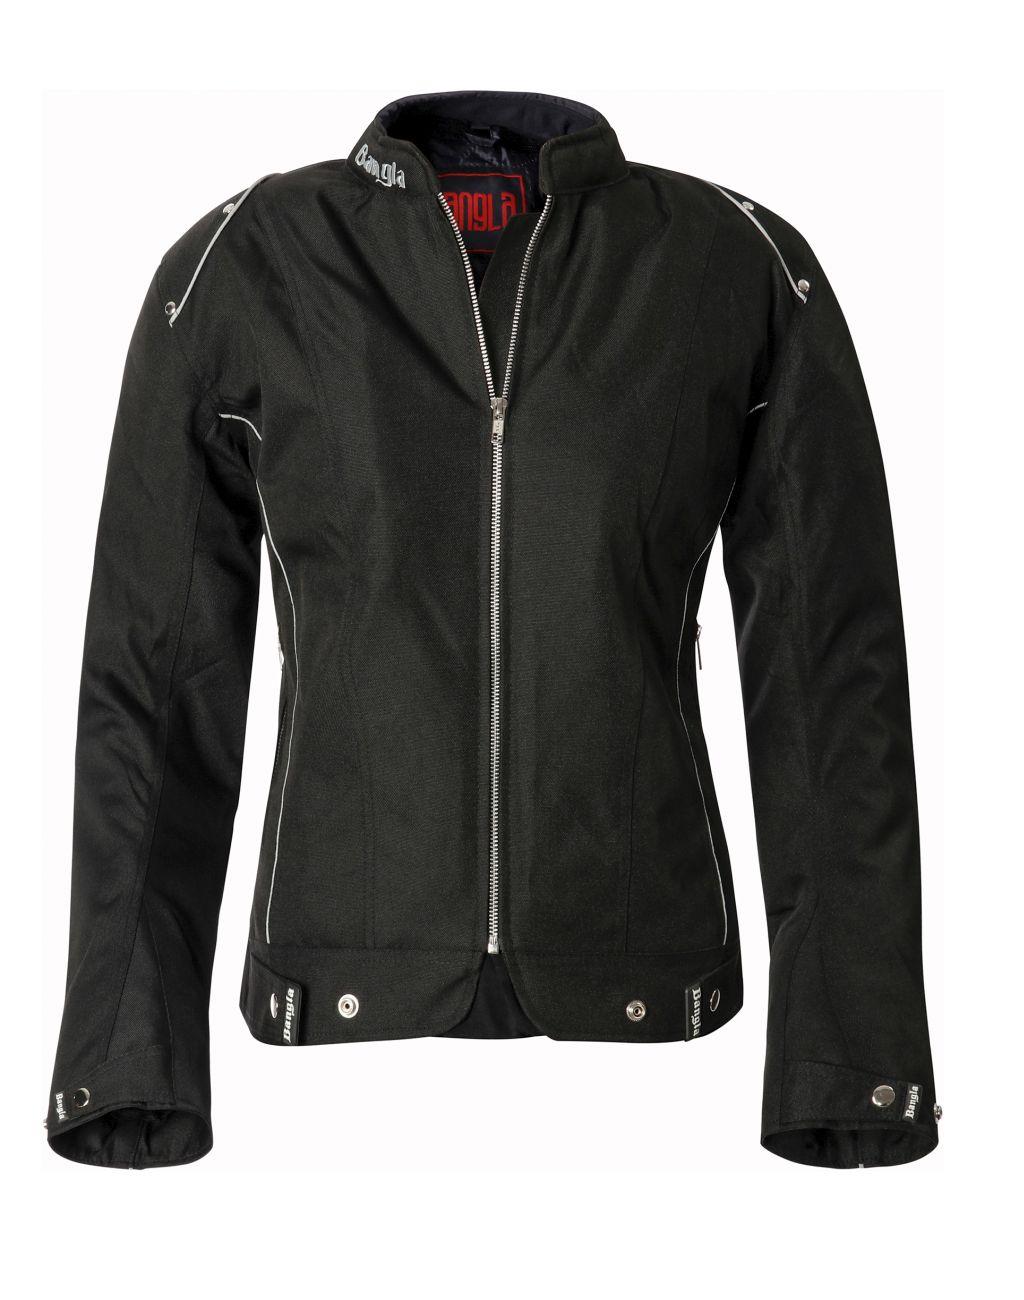 Bangla Damen Motorrad Jacke Motorradjacke Textil Schwarz kurz S M L XL XXL XXXL